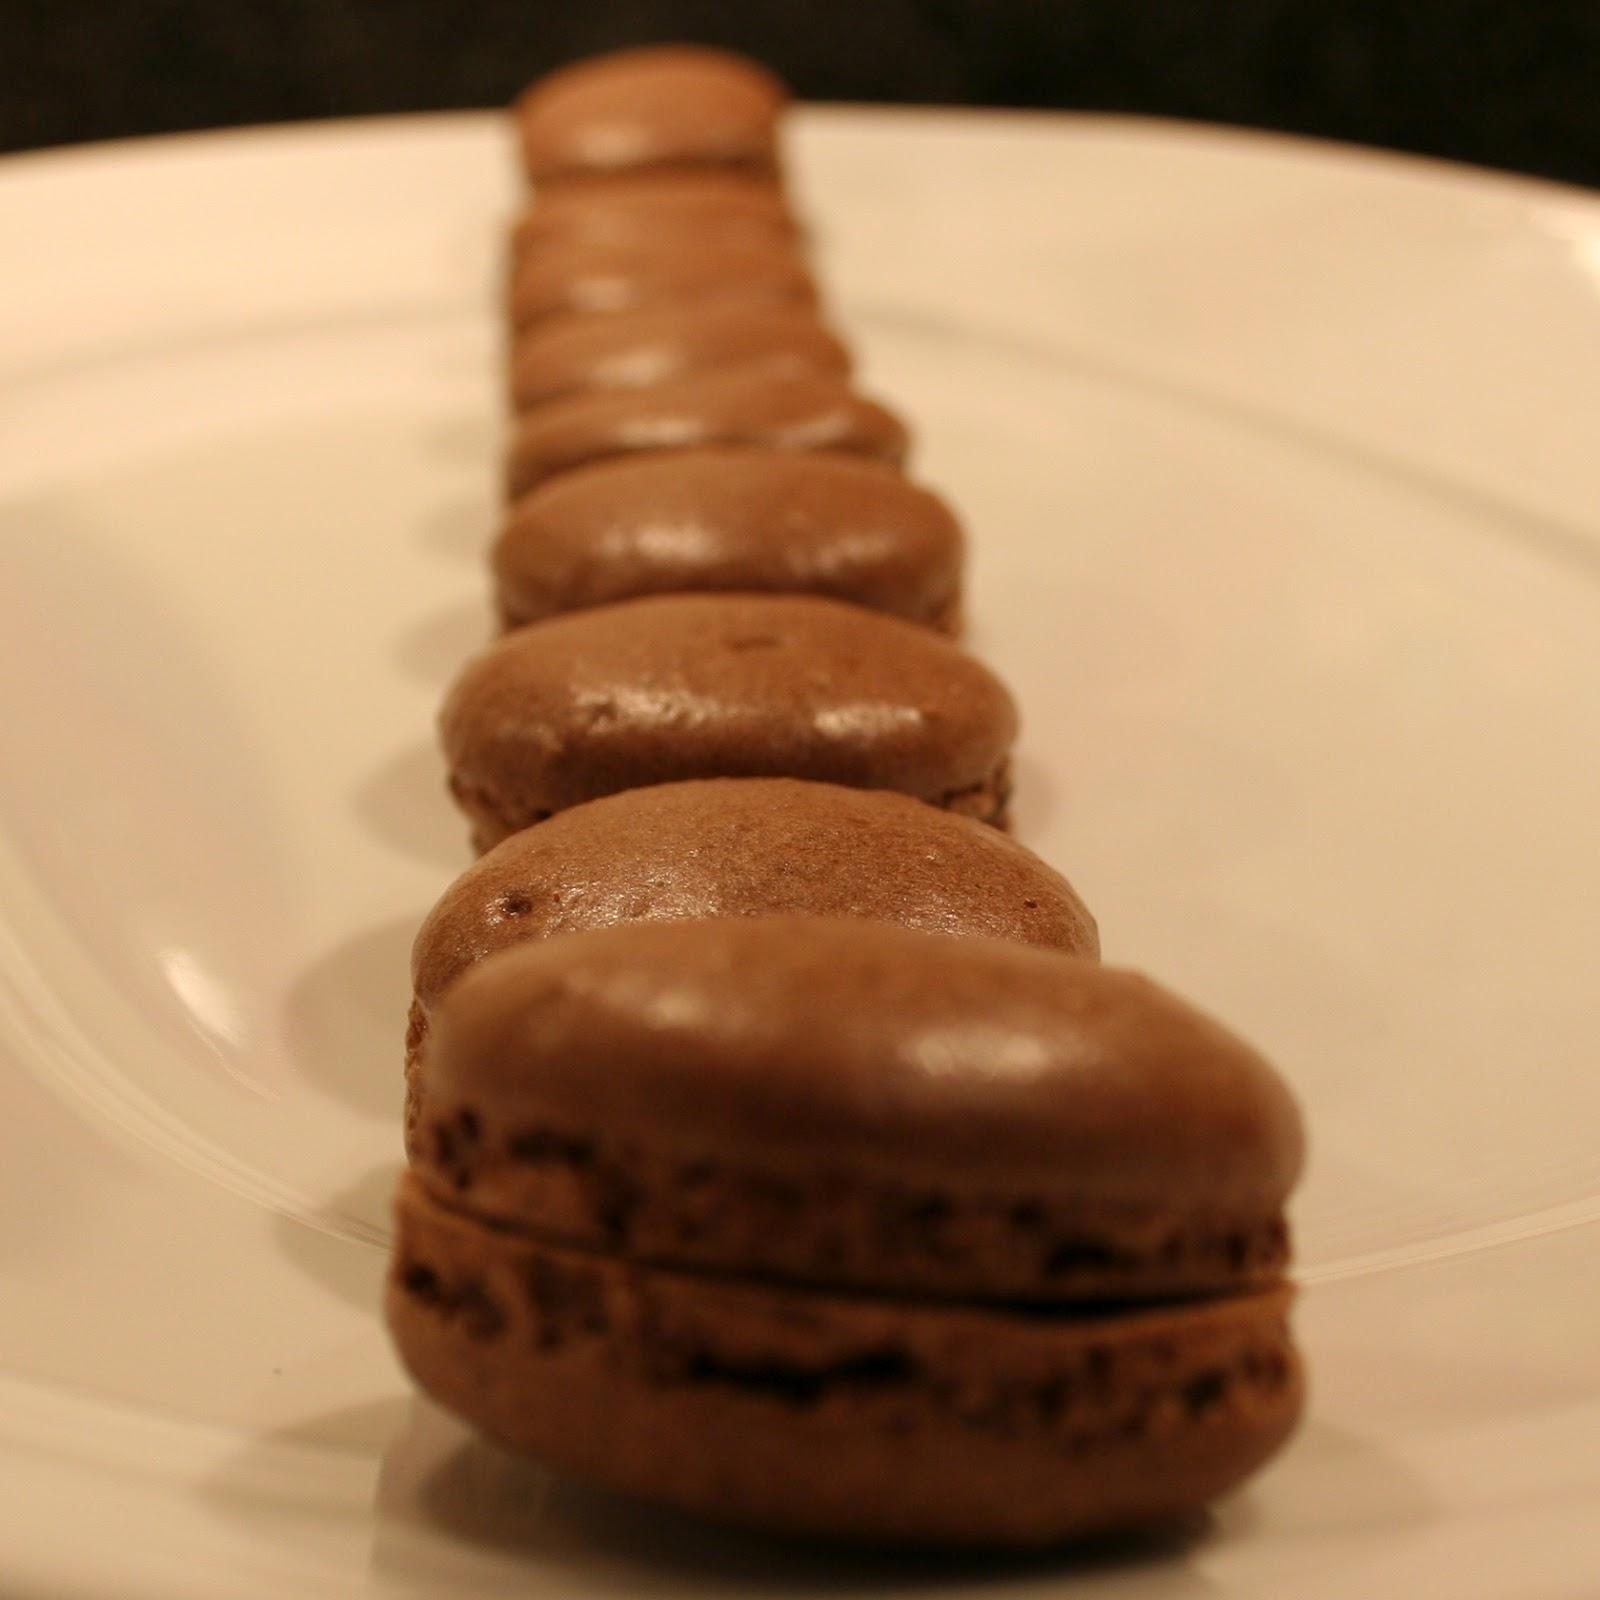 Pâtisserie Nadine: Macarons au Chocolat - French Chocolate ...